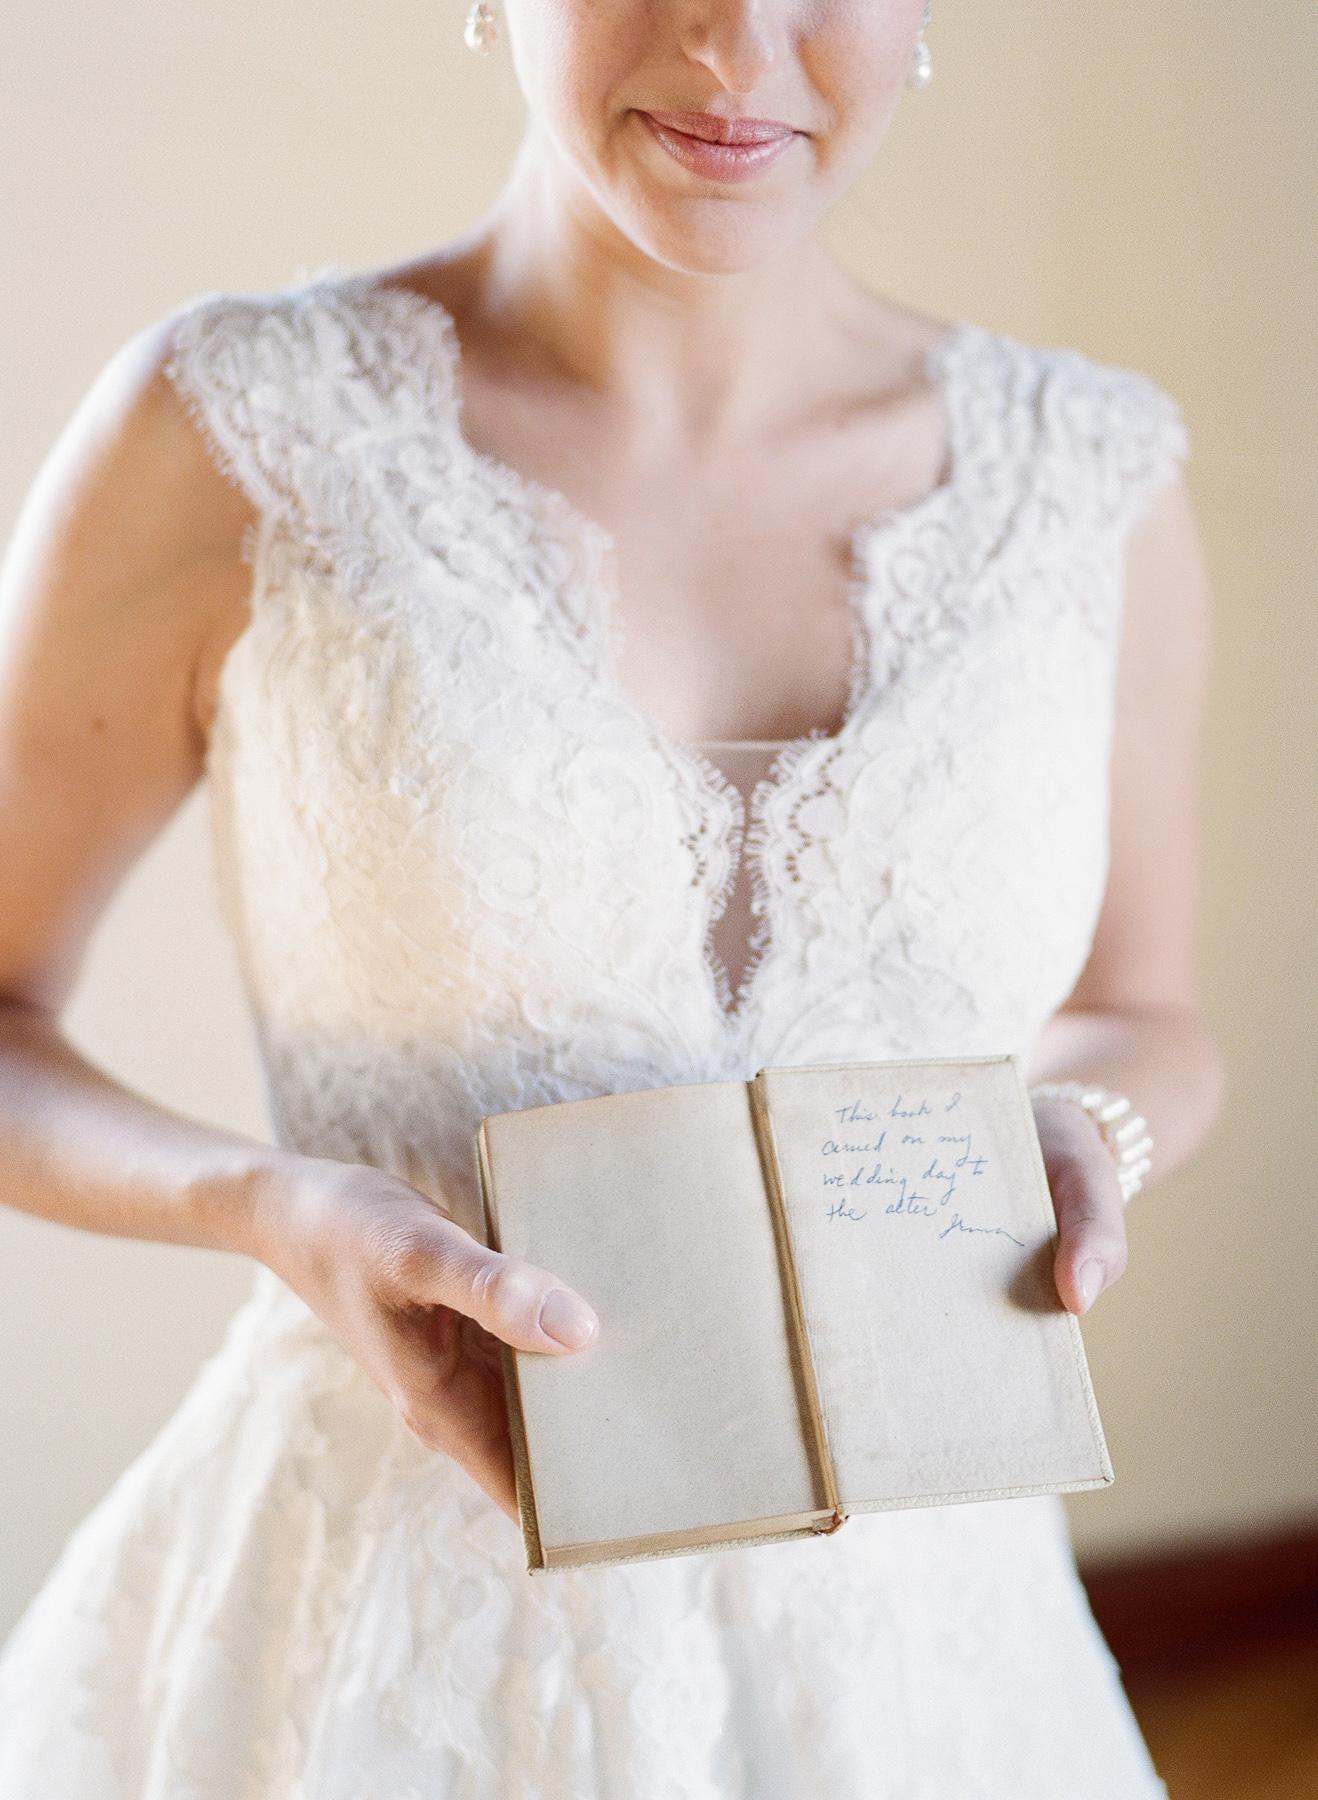 Bride's Grandmother's Prayer Book